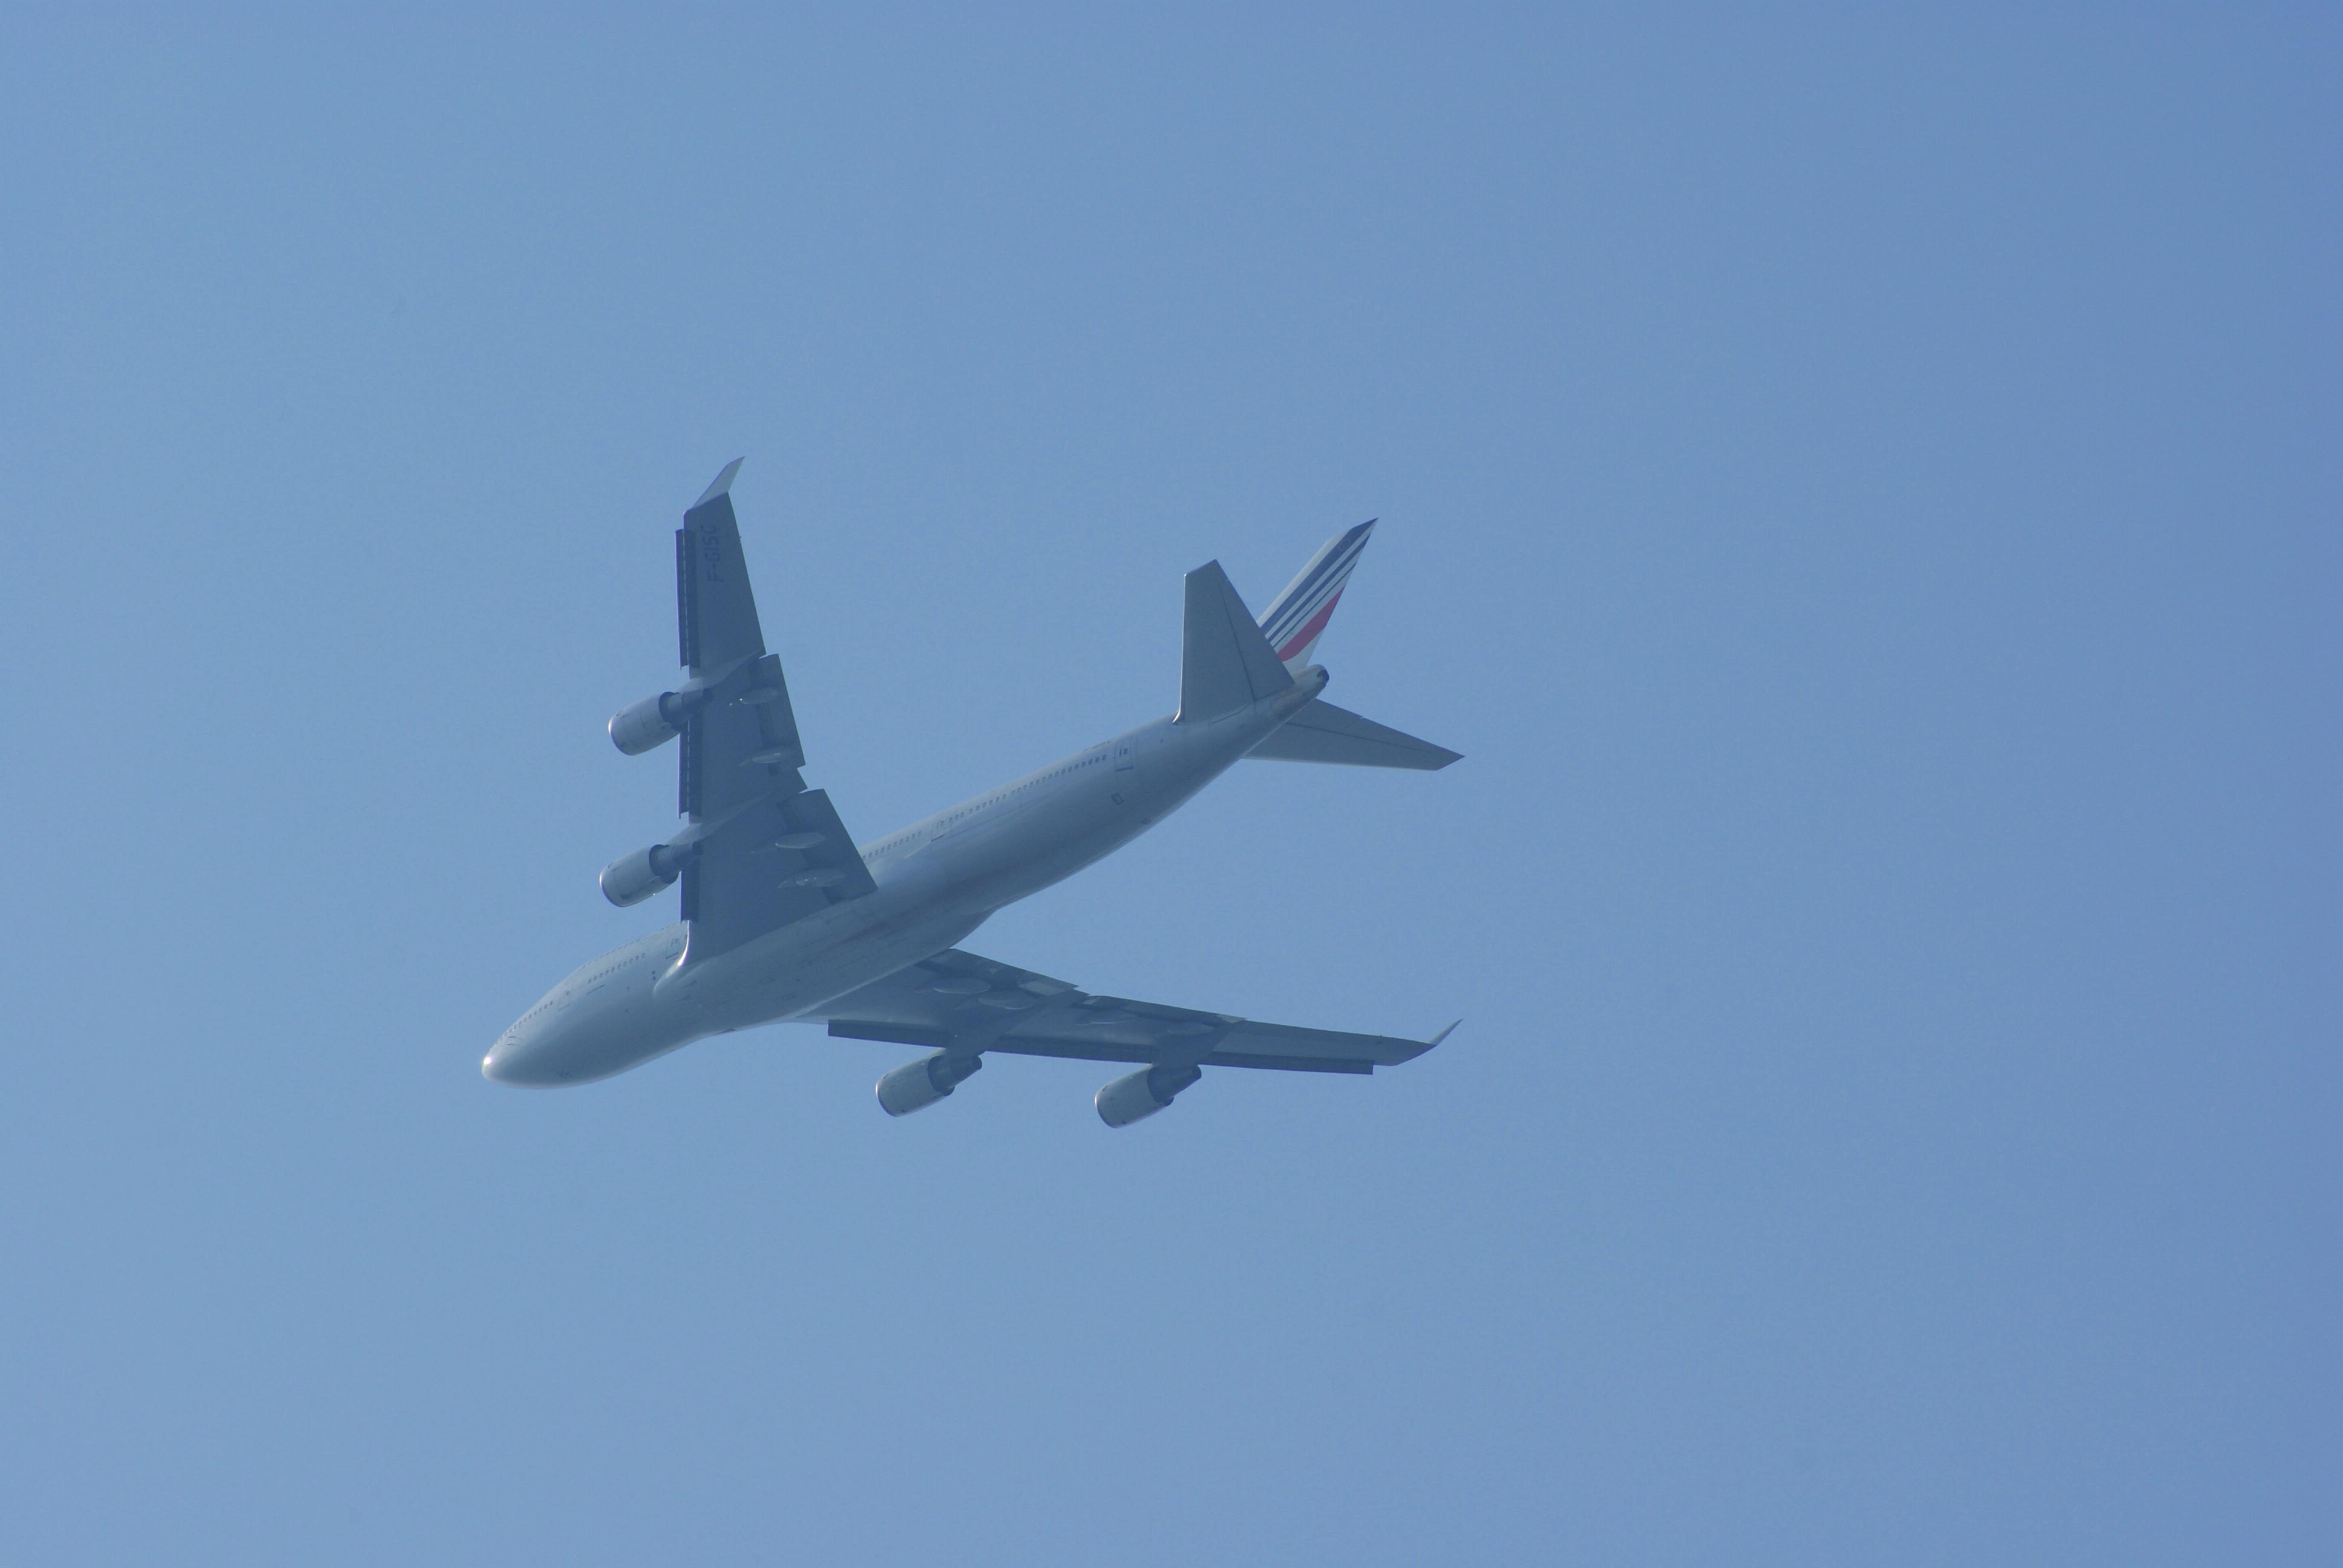 Jet In Flight, Air, Plane, High, Icon, HQ Photo